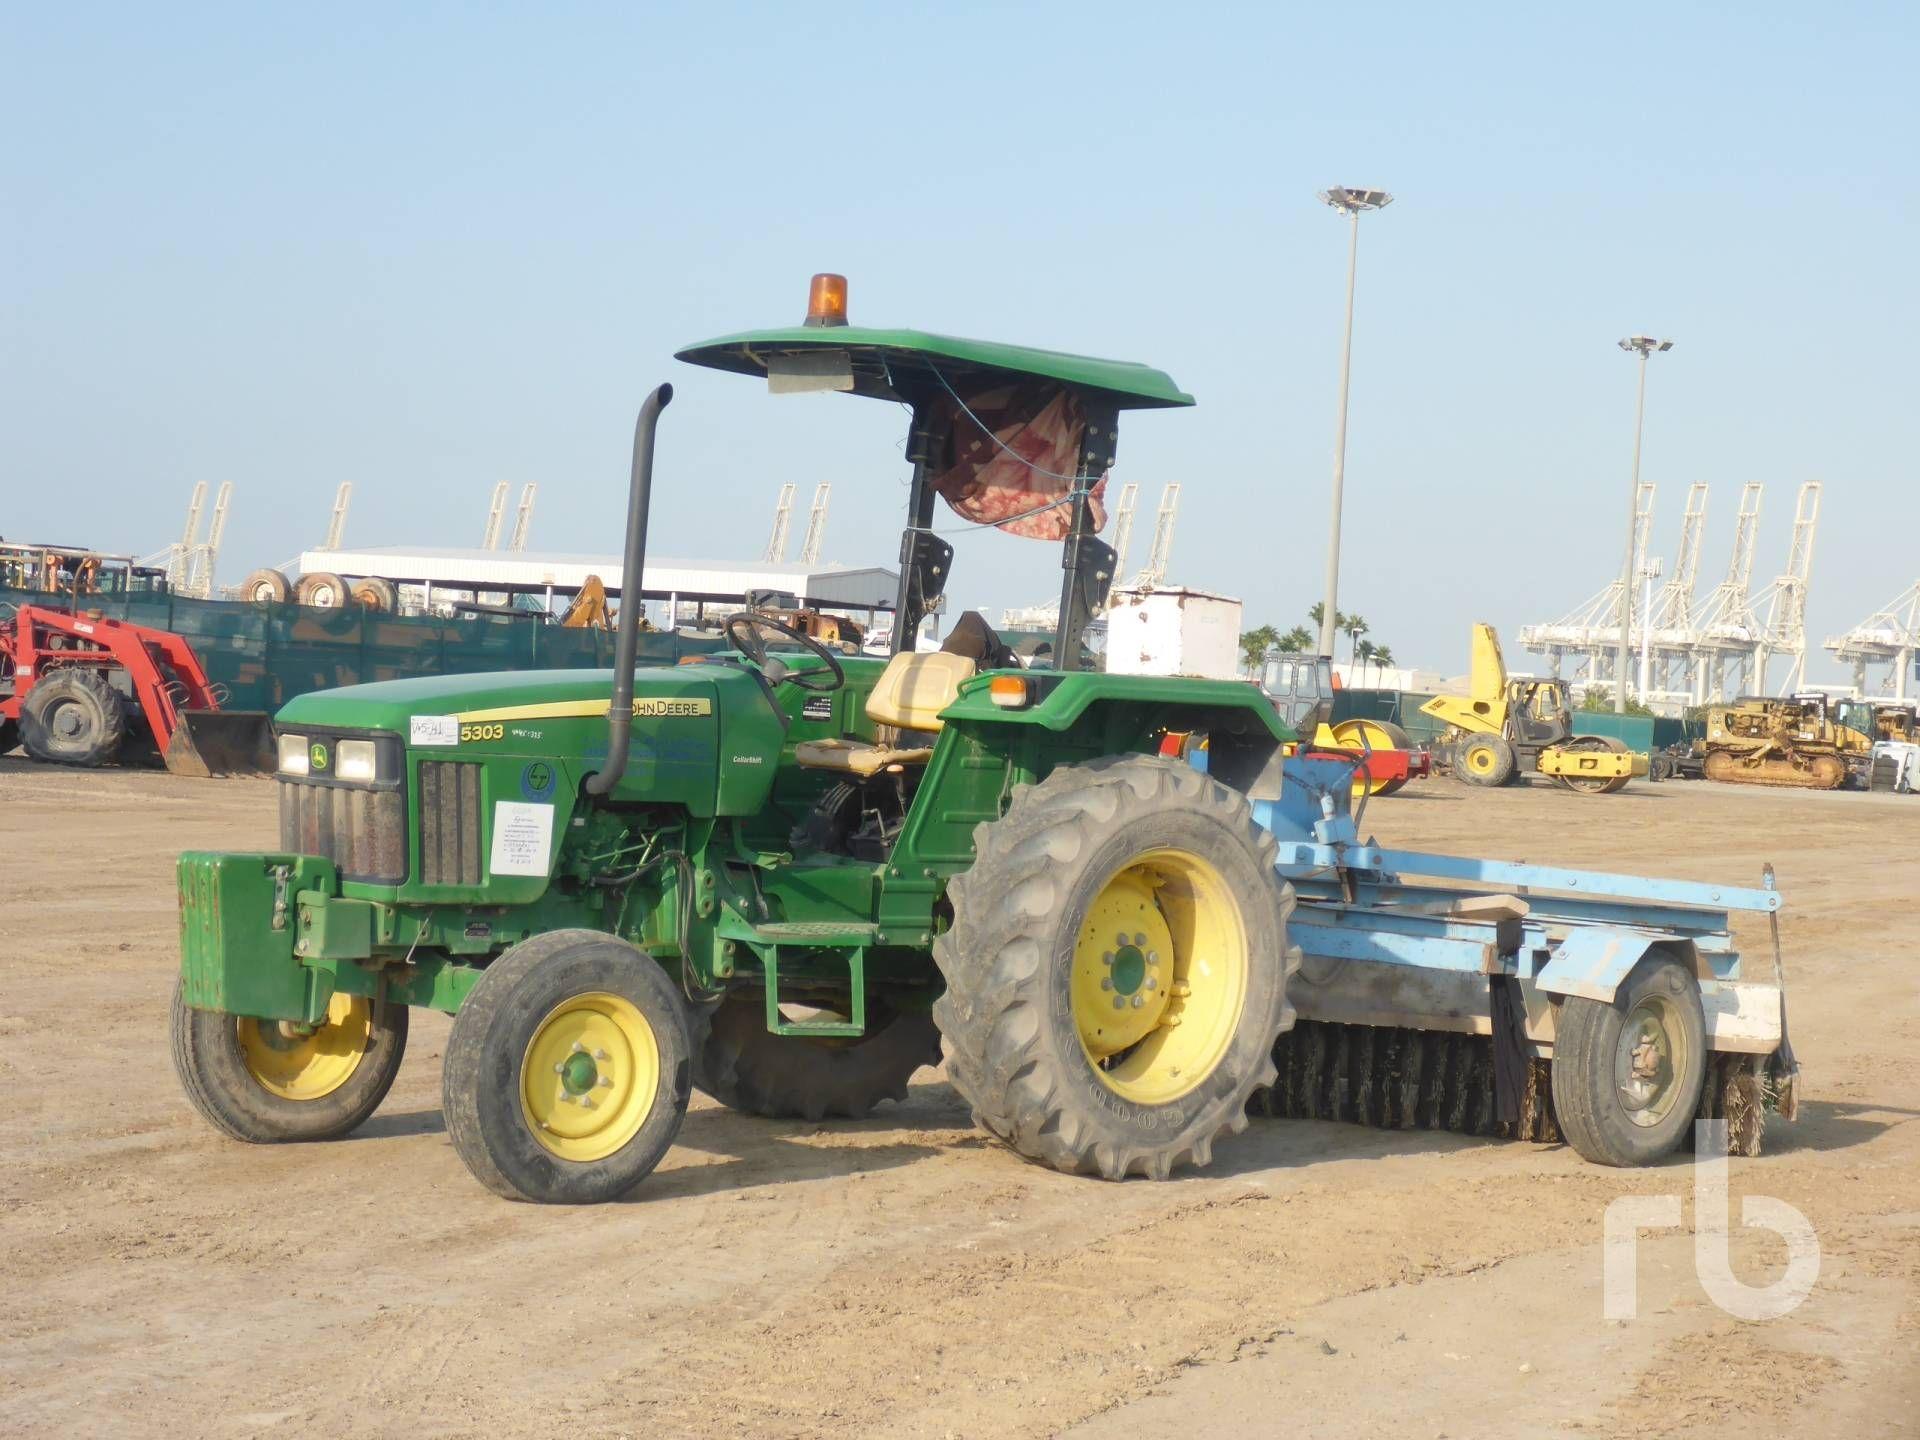 JOHN DEERE 5303C 2WD Traktor